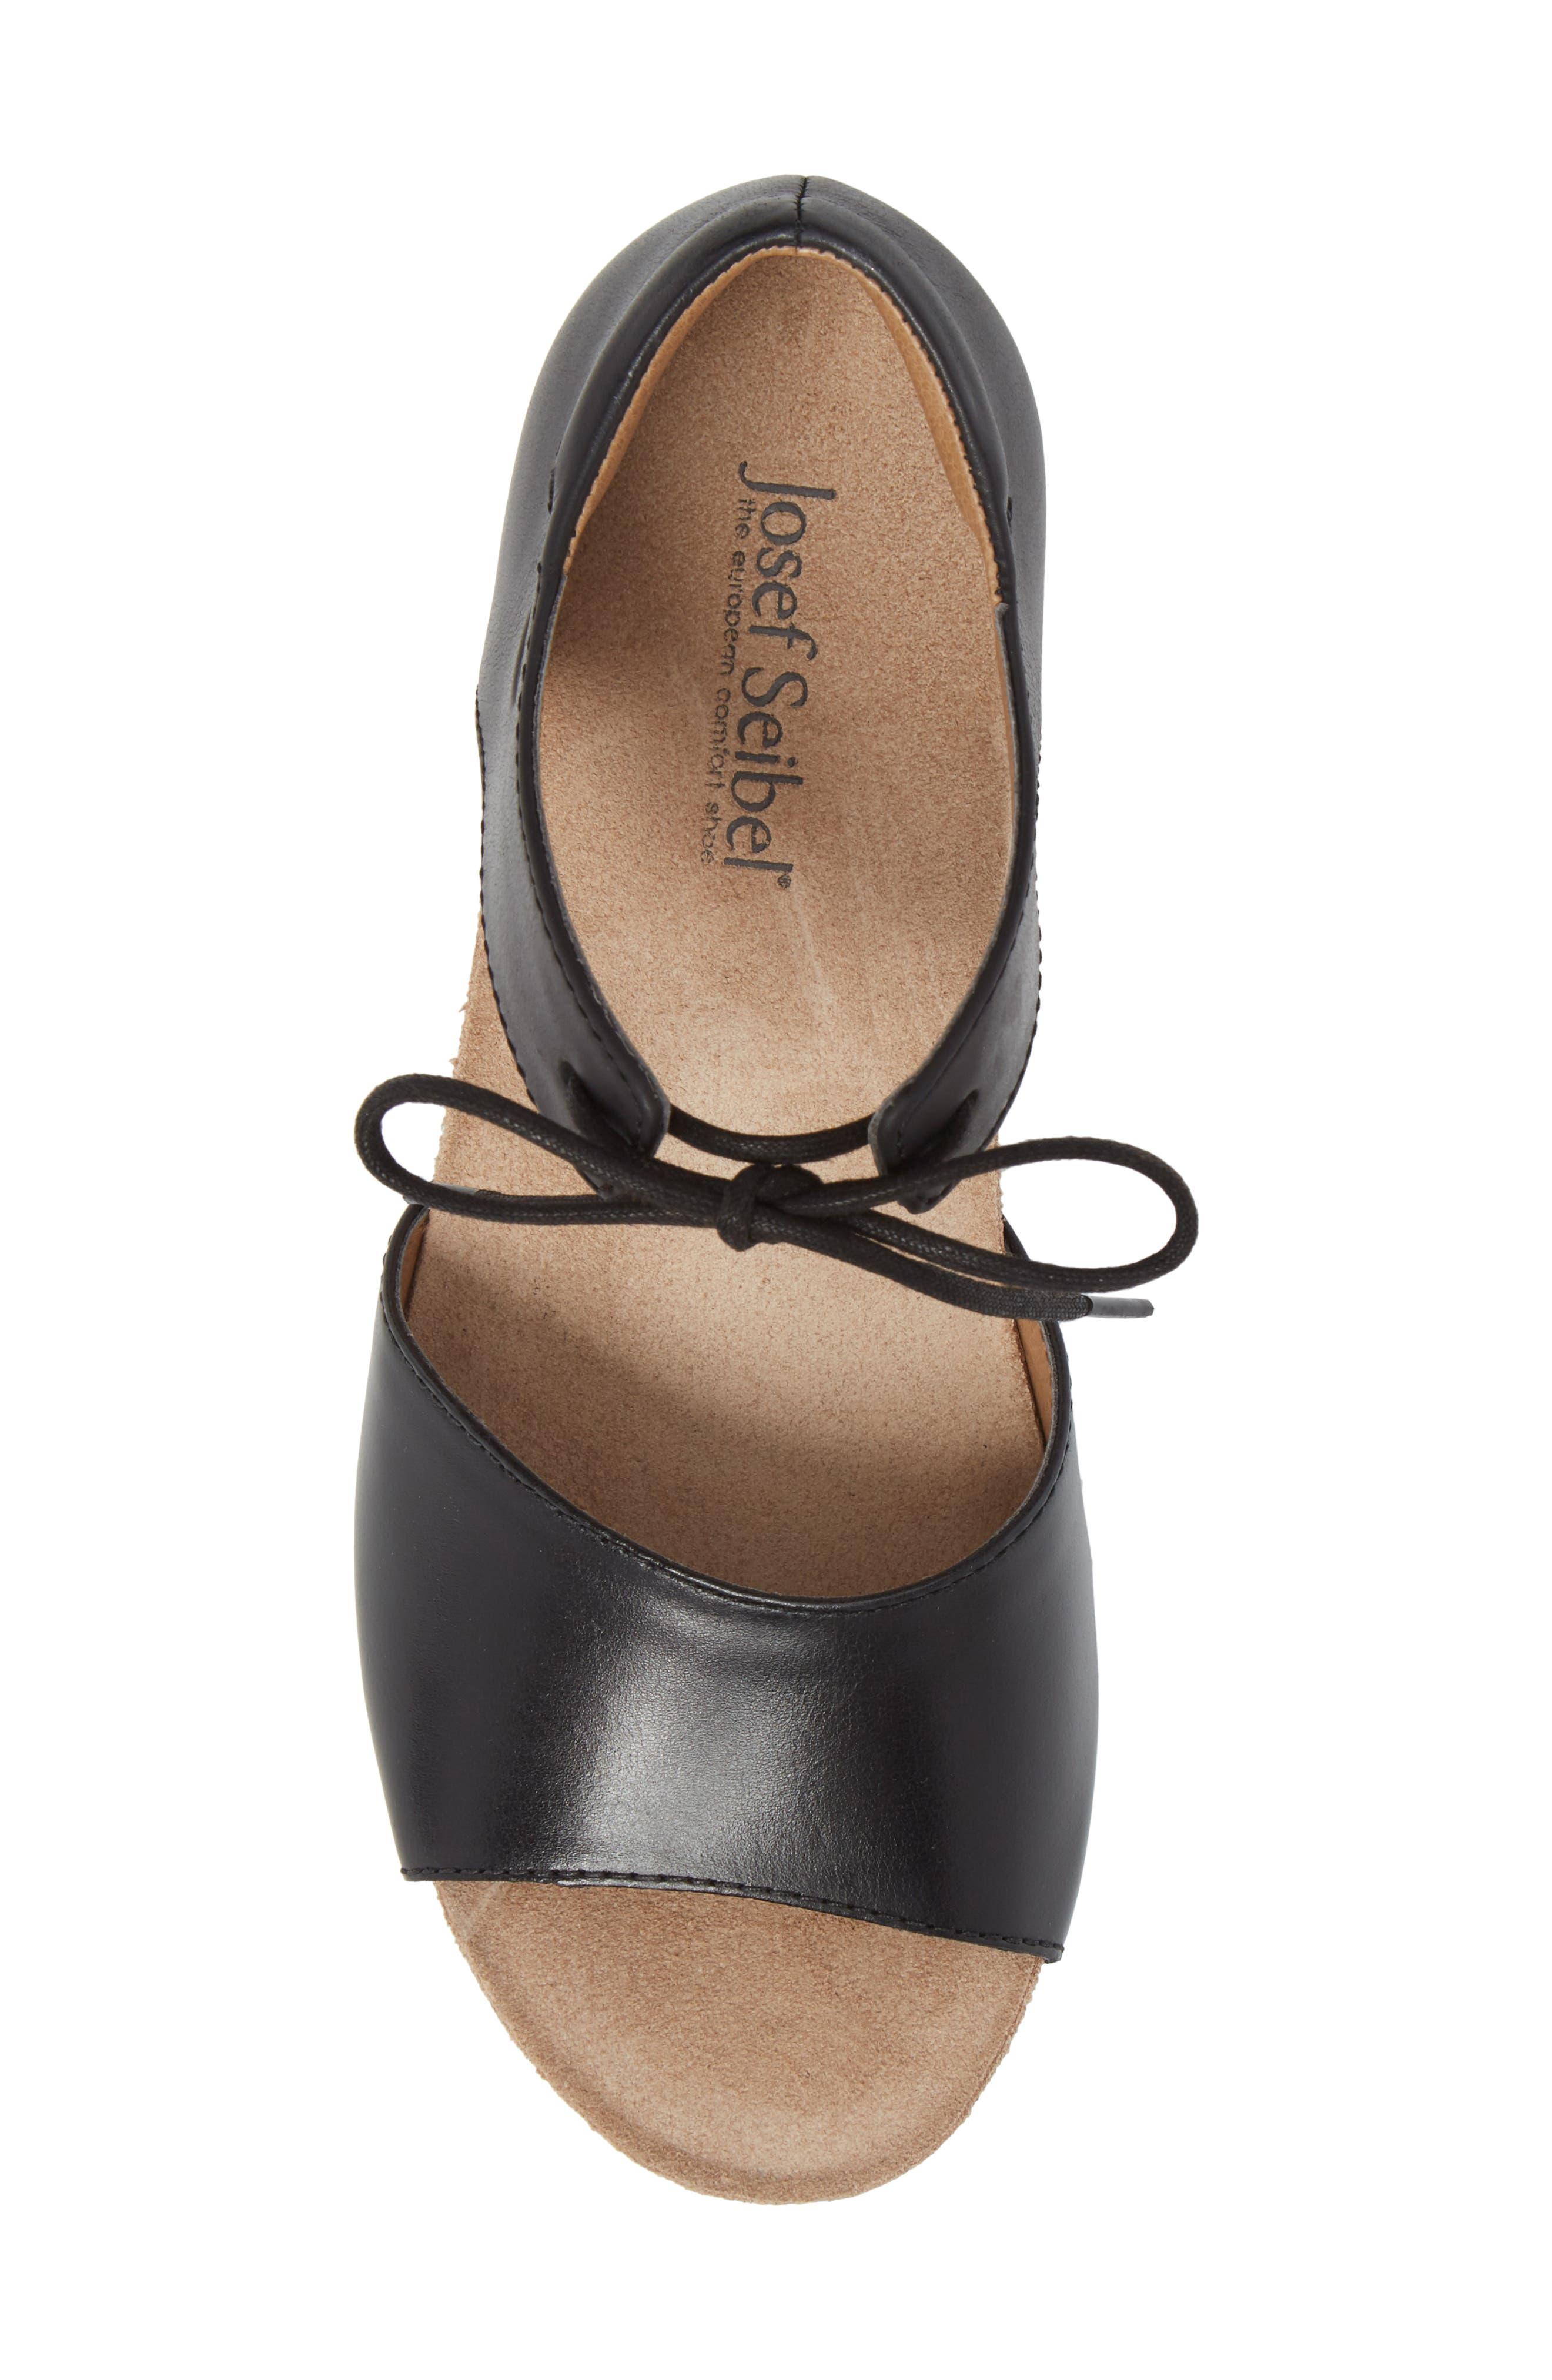 JOSEF SEIBEL,                             Rose 23 Tie Front Sandal,                             Alternate thumbnail 5, color,                             001